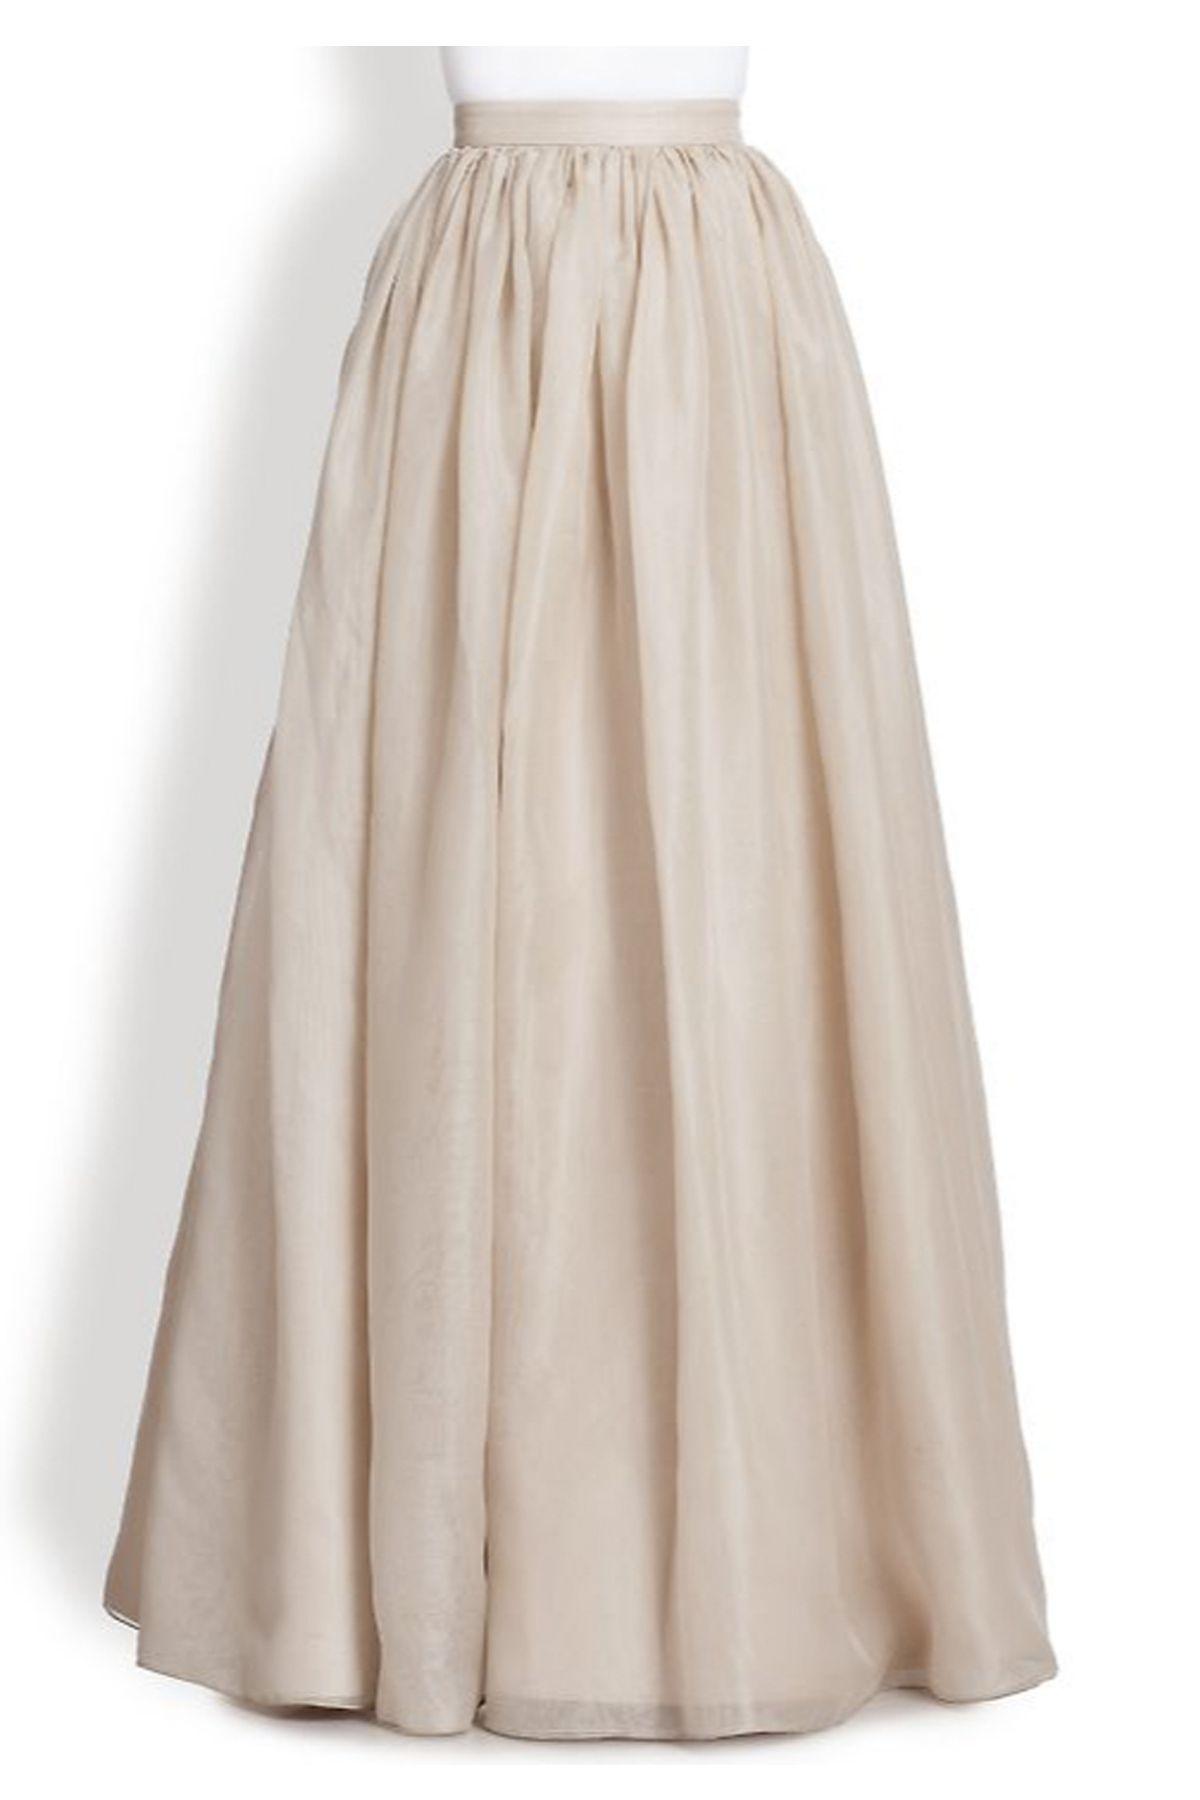 e928887cc9111 Plus Size Ivory Chiffon Off White Flowing Maxi Skirt